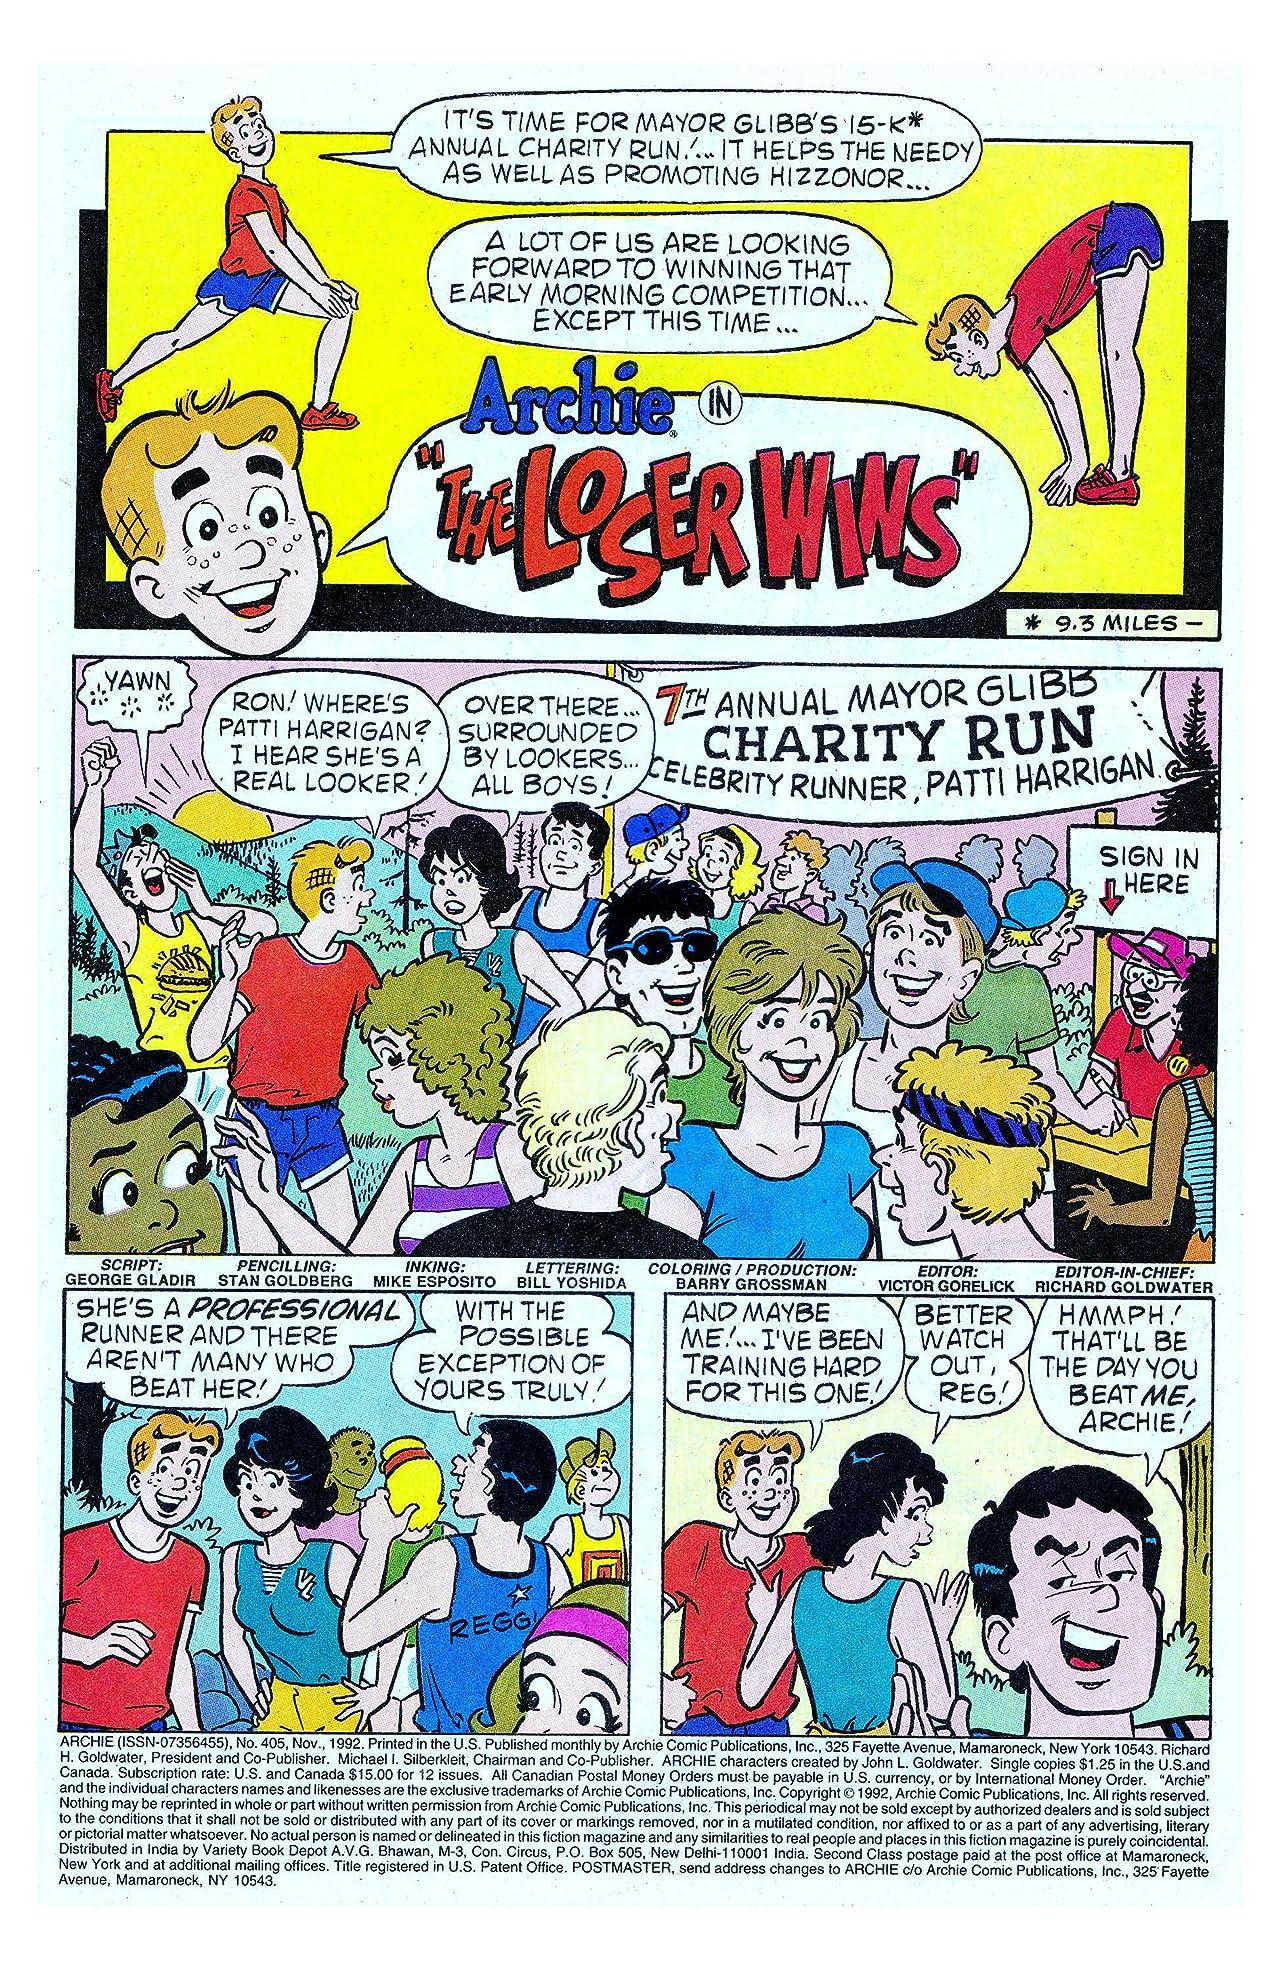 Archie #405